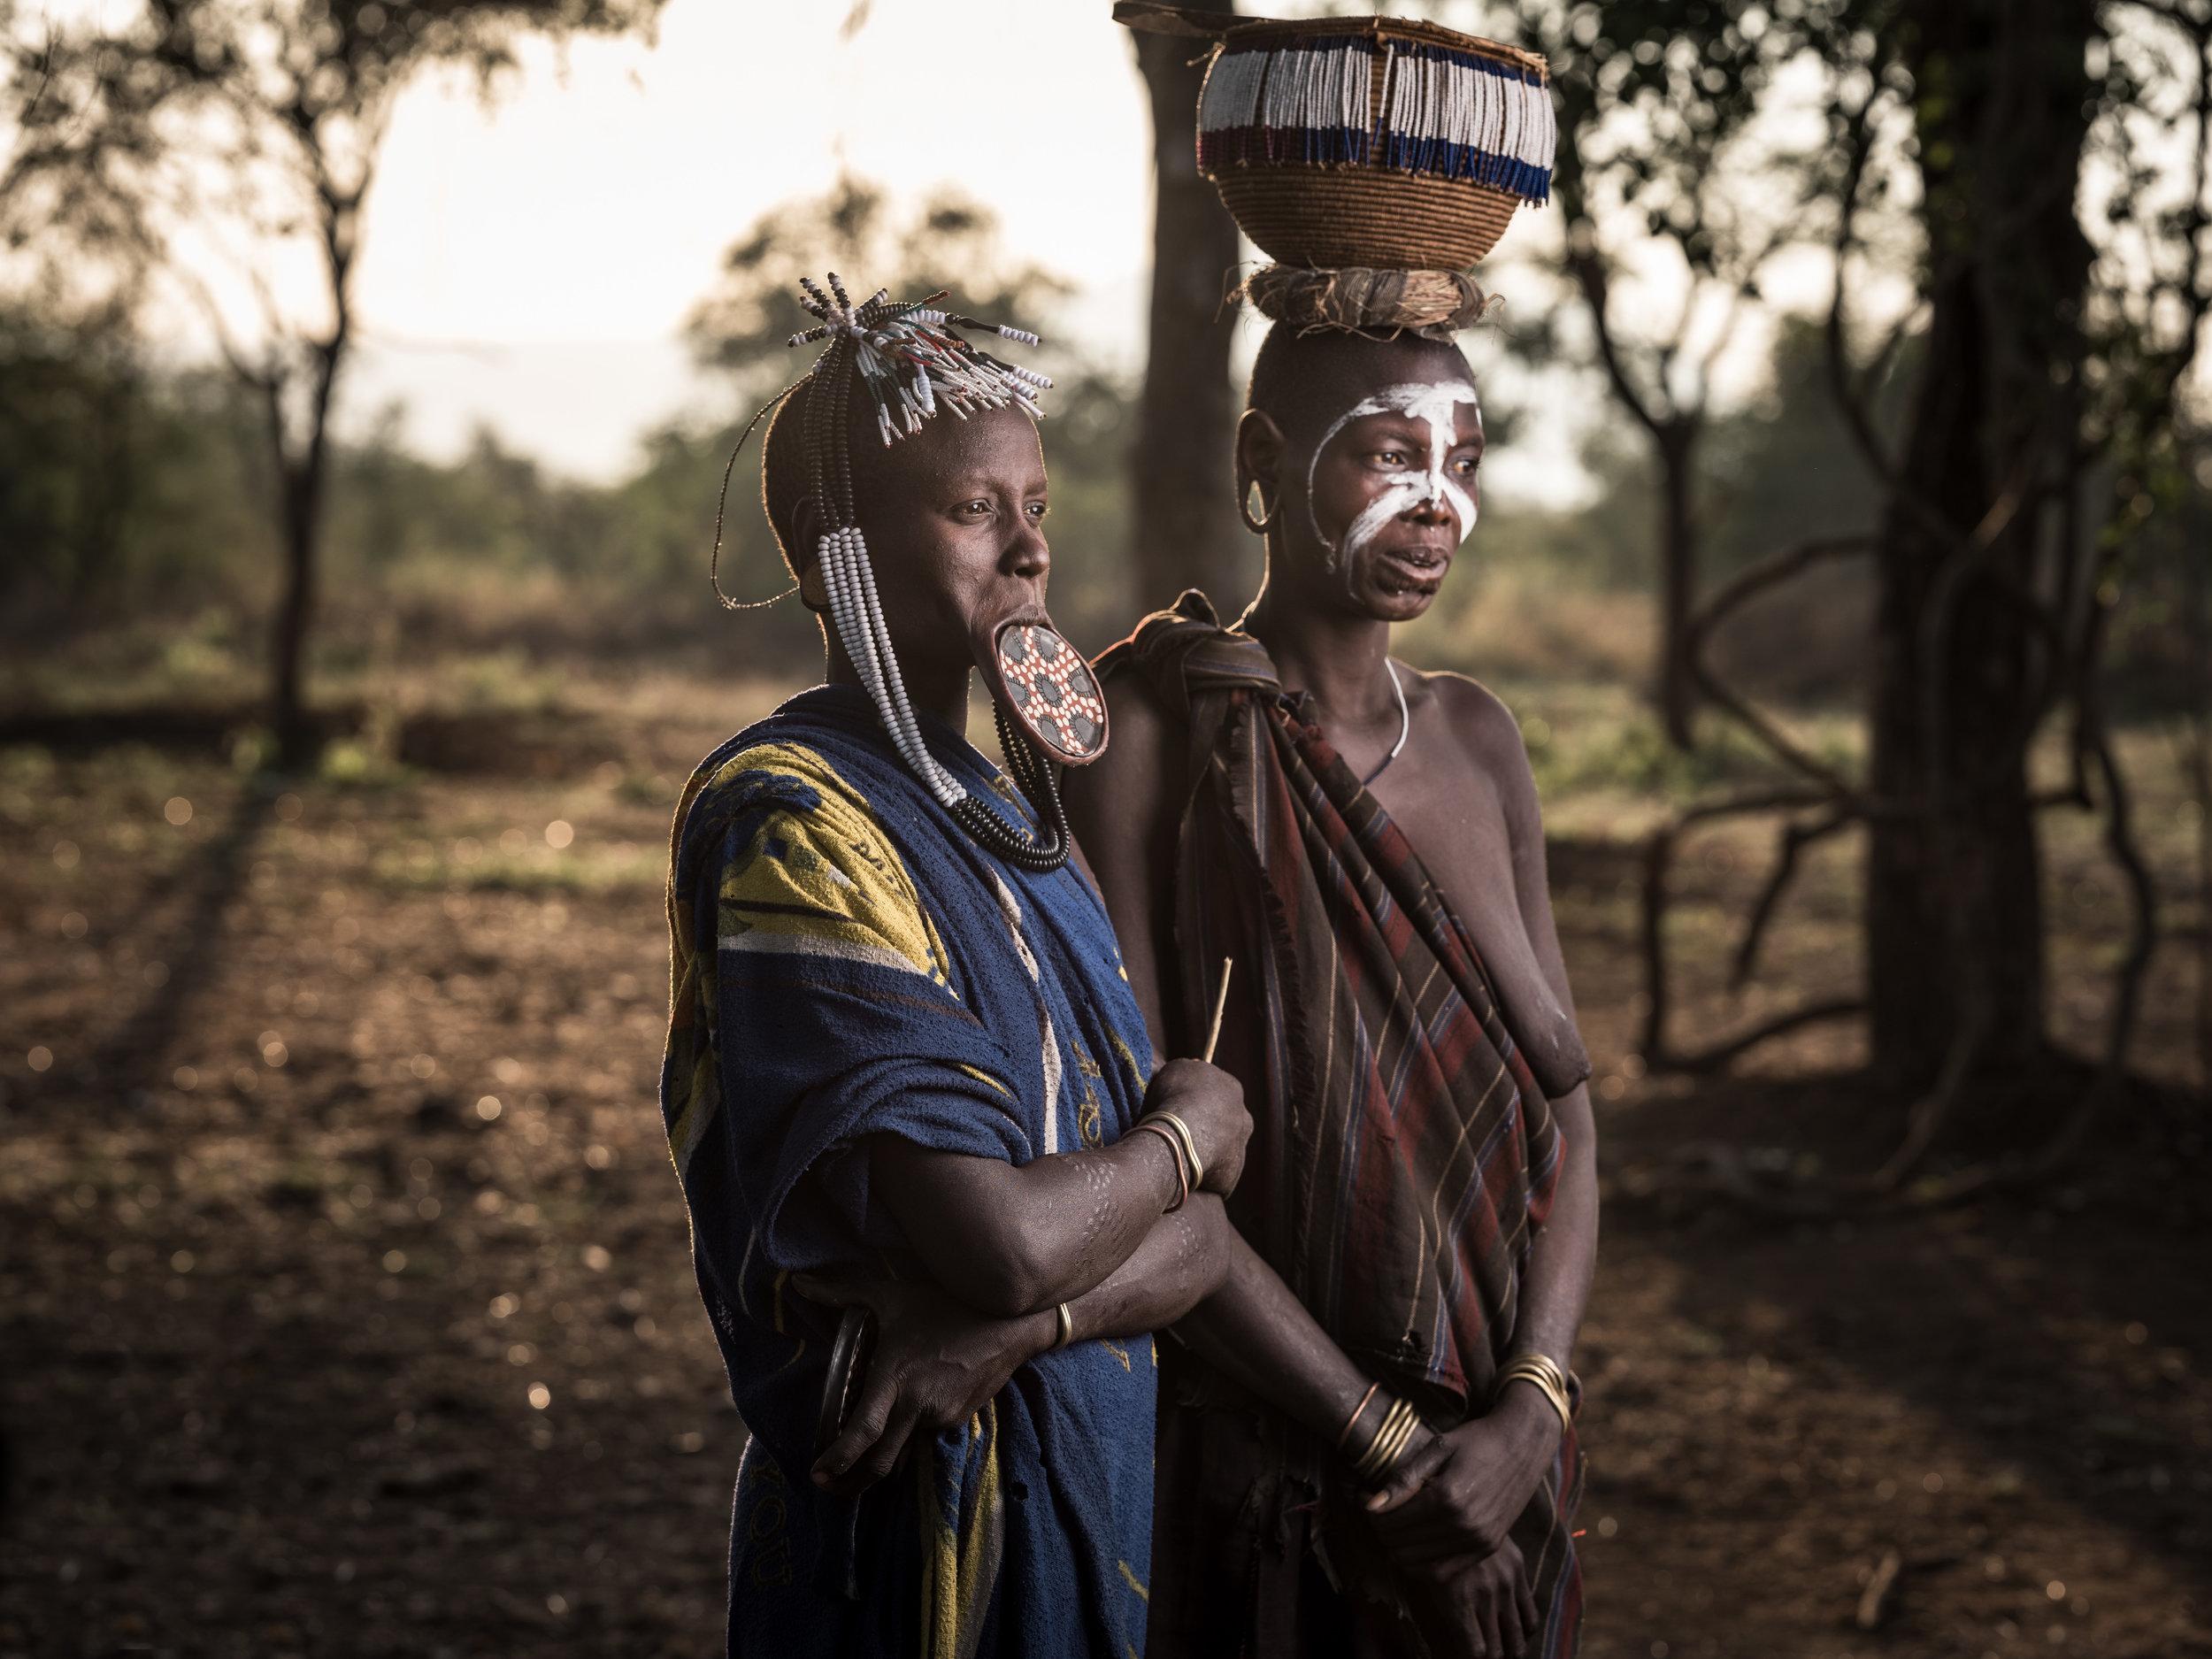 Ethiopia-Starling-PietVandenEynde_020.jpg